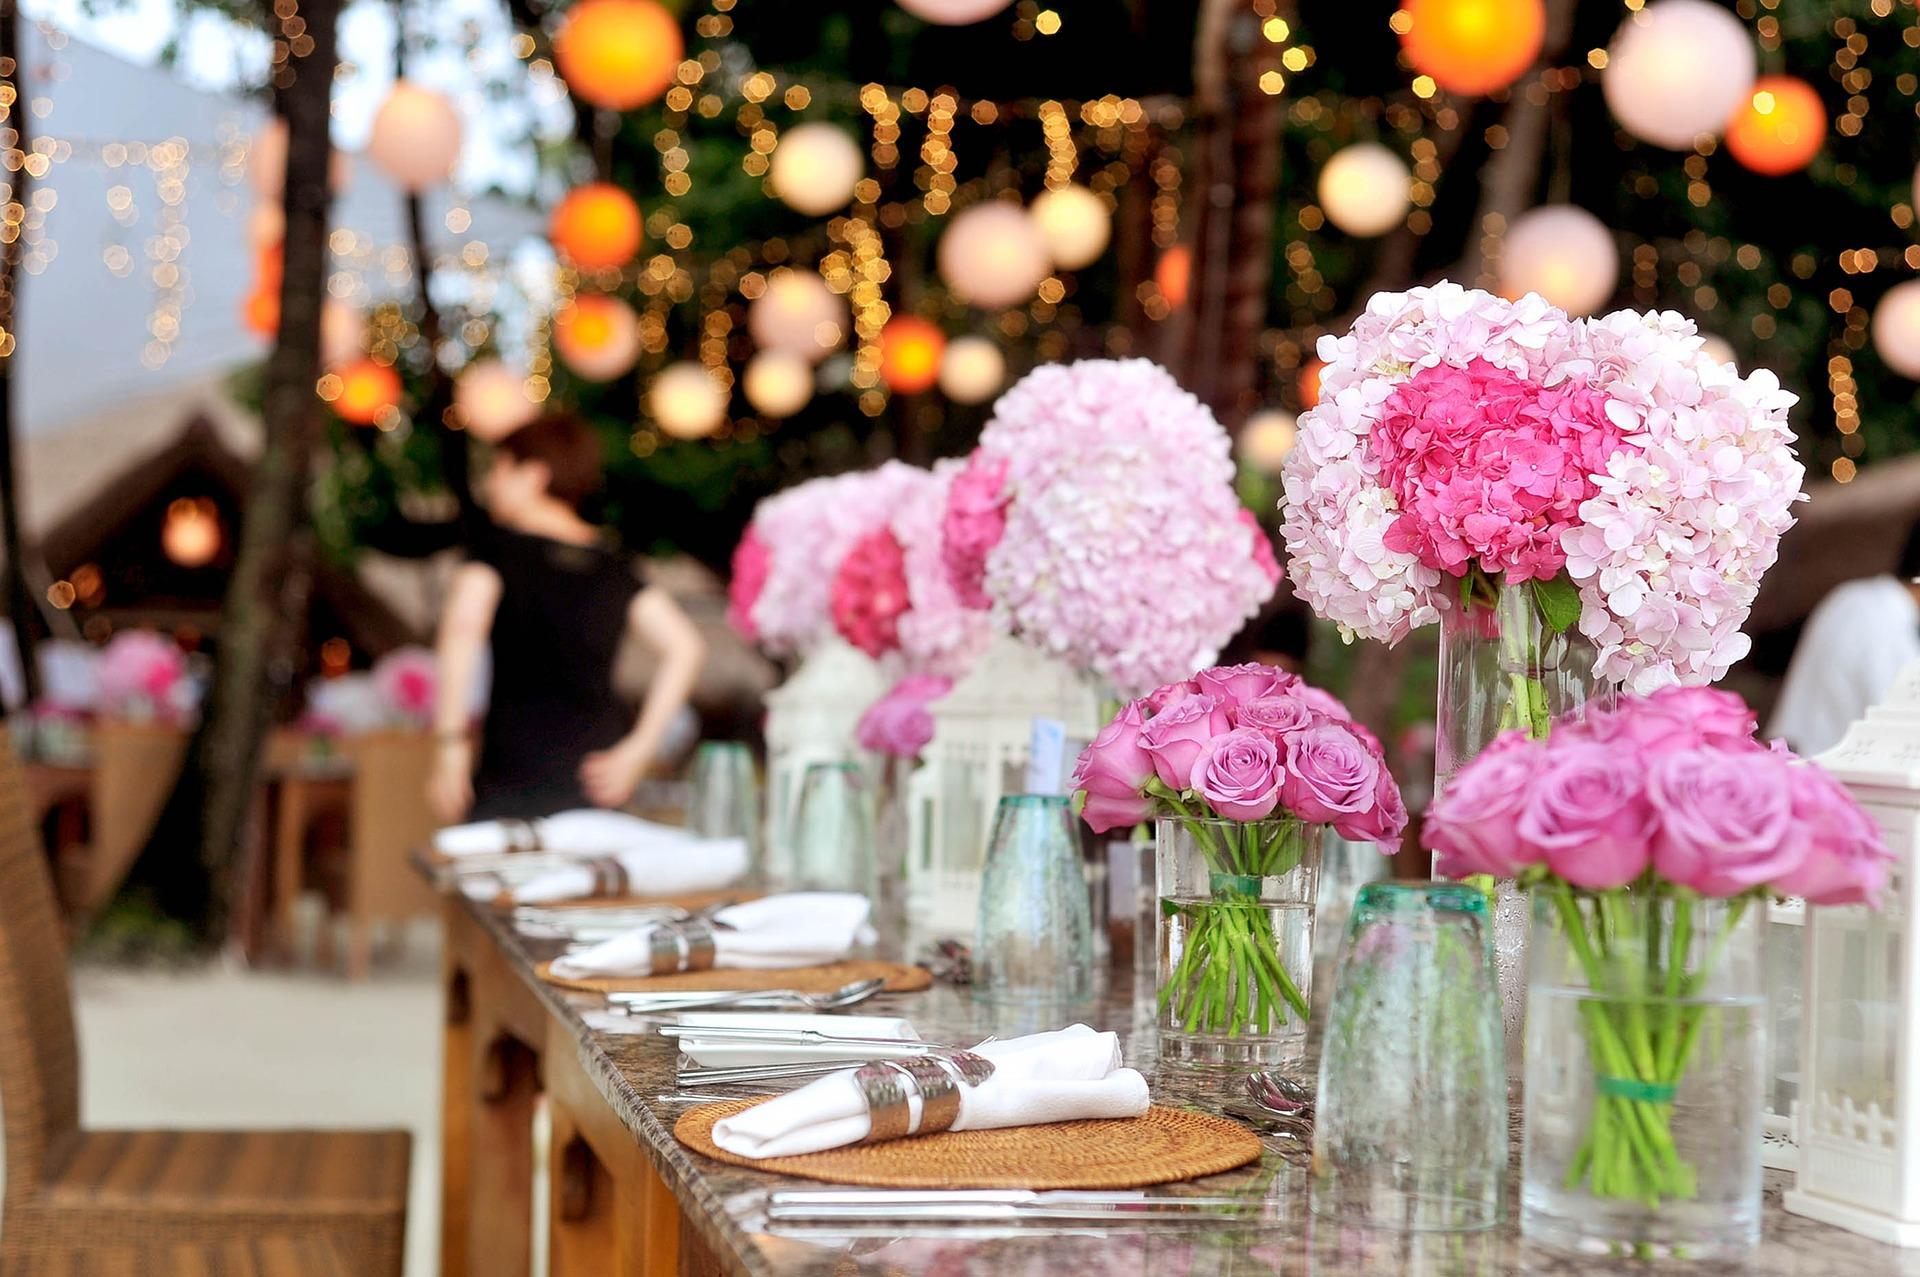 LA-Signature-Events-Wedding-Planning.jpg